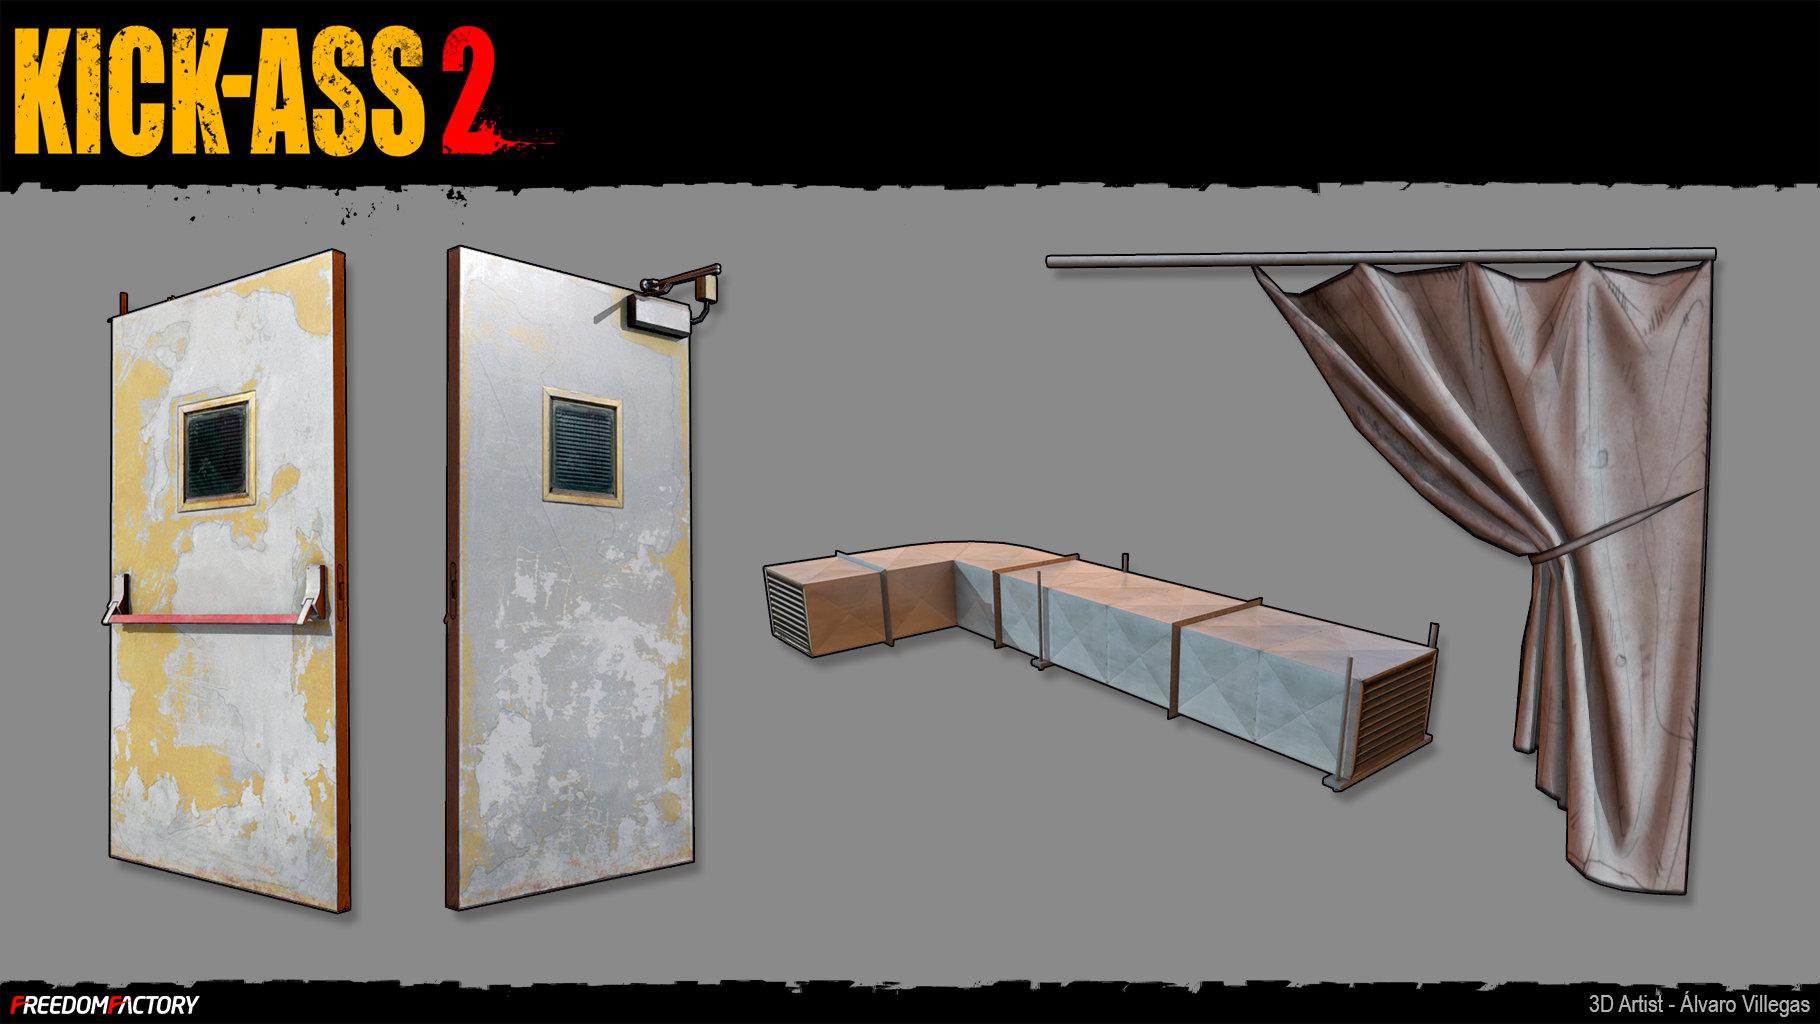 ArtStation - Kick-Ass 2: Basement props, Alvaro Villegas